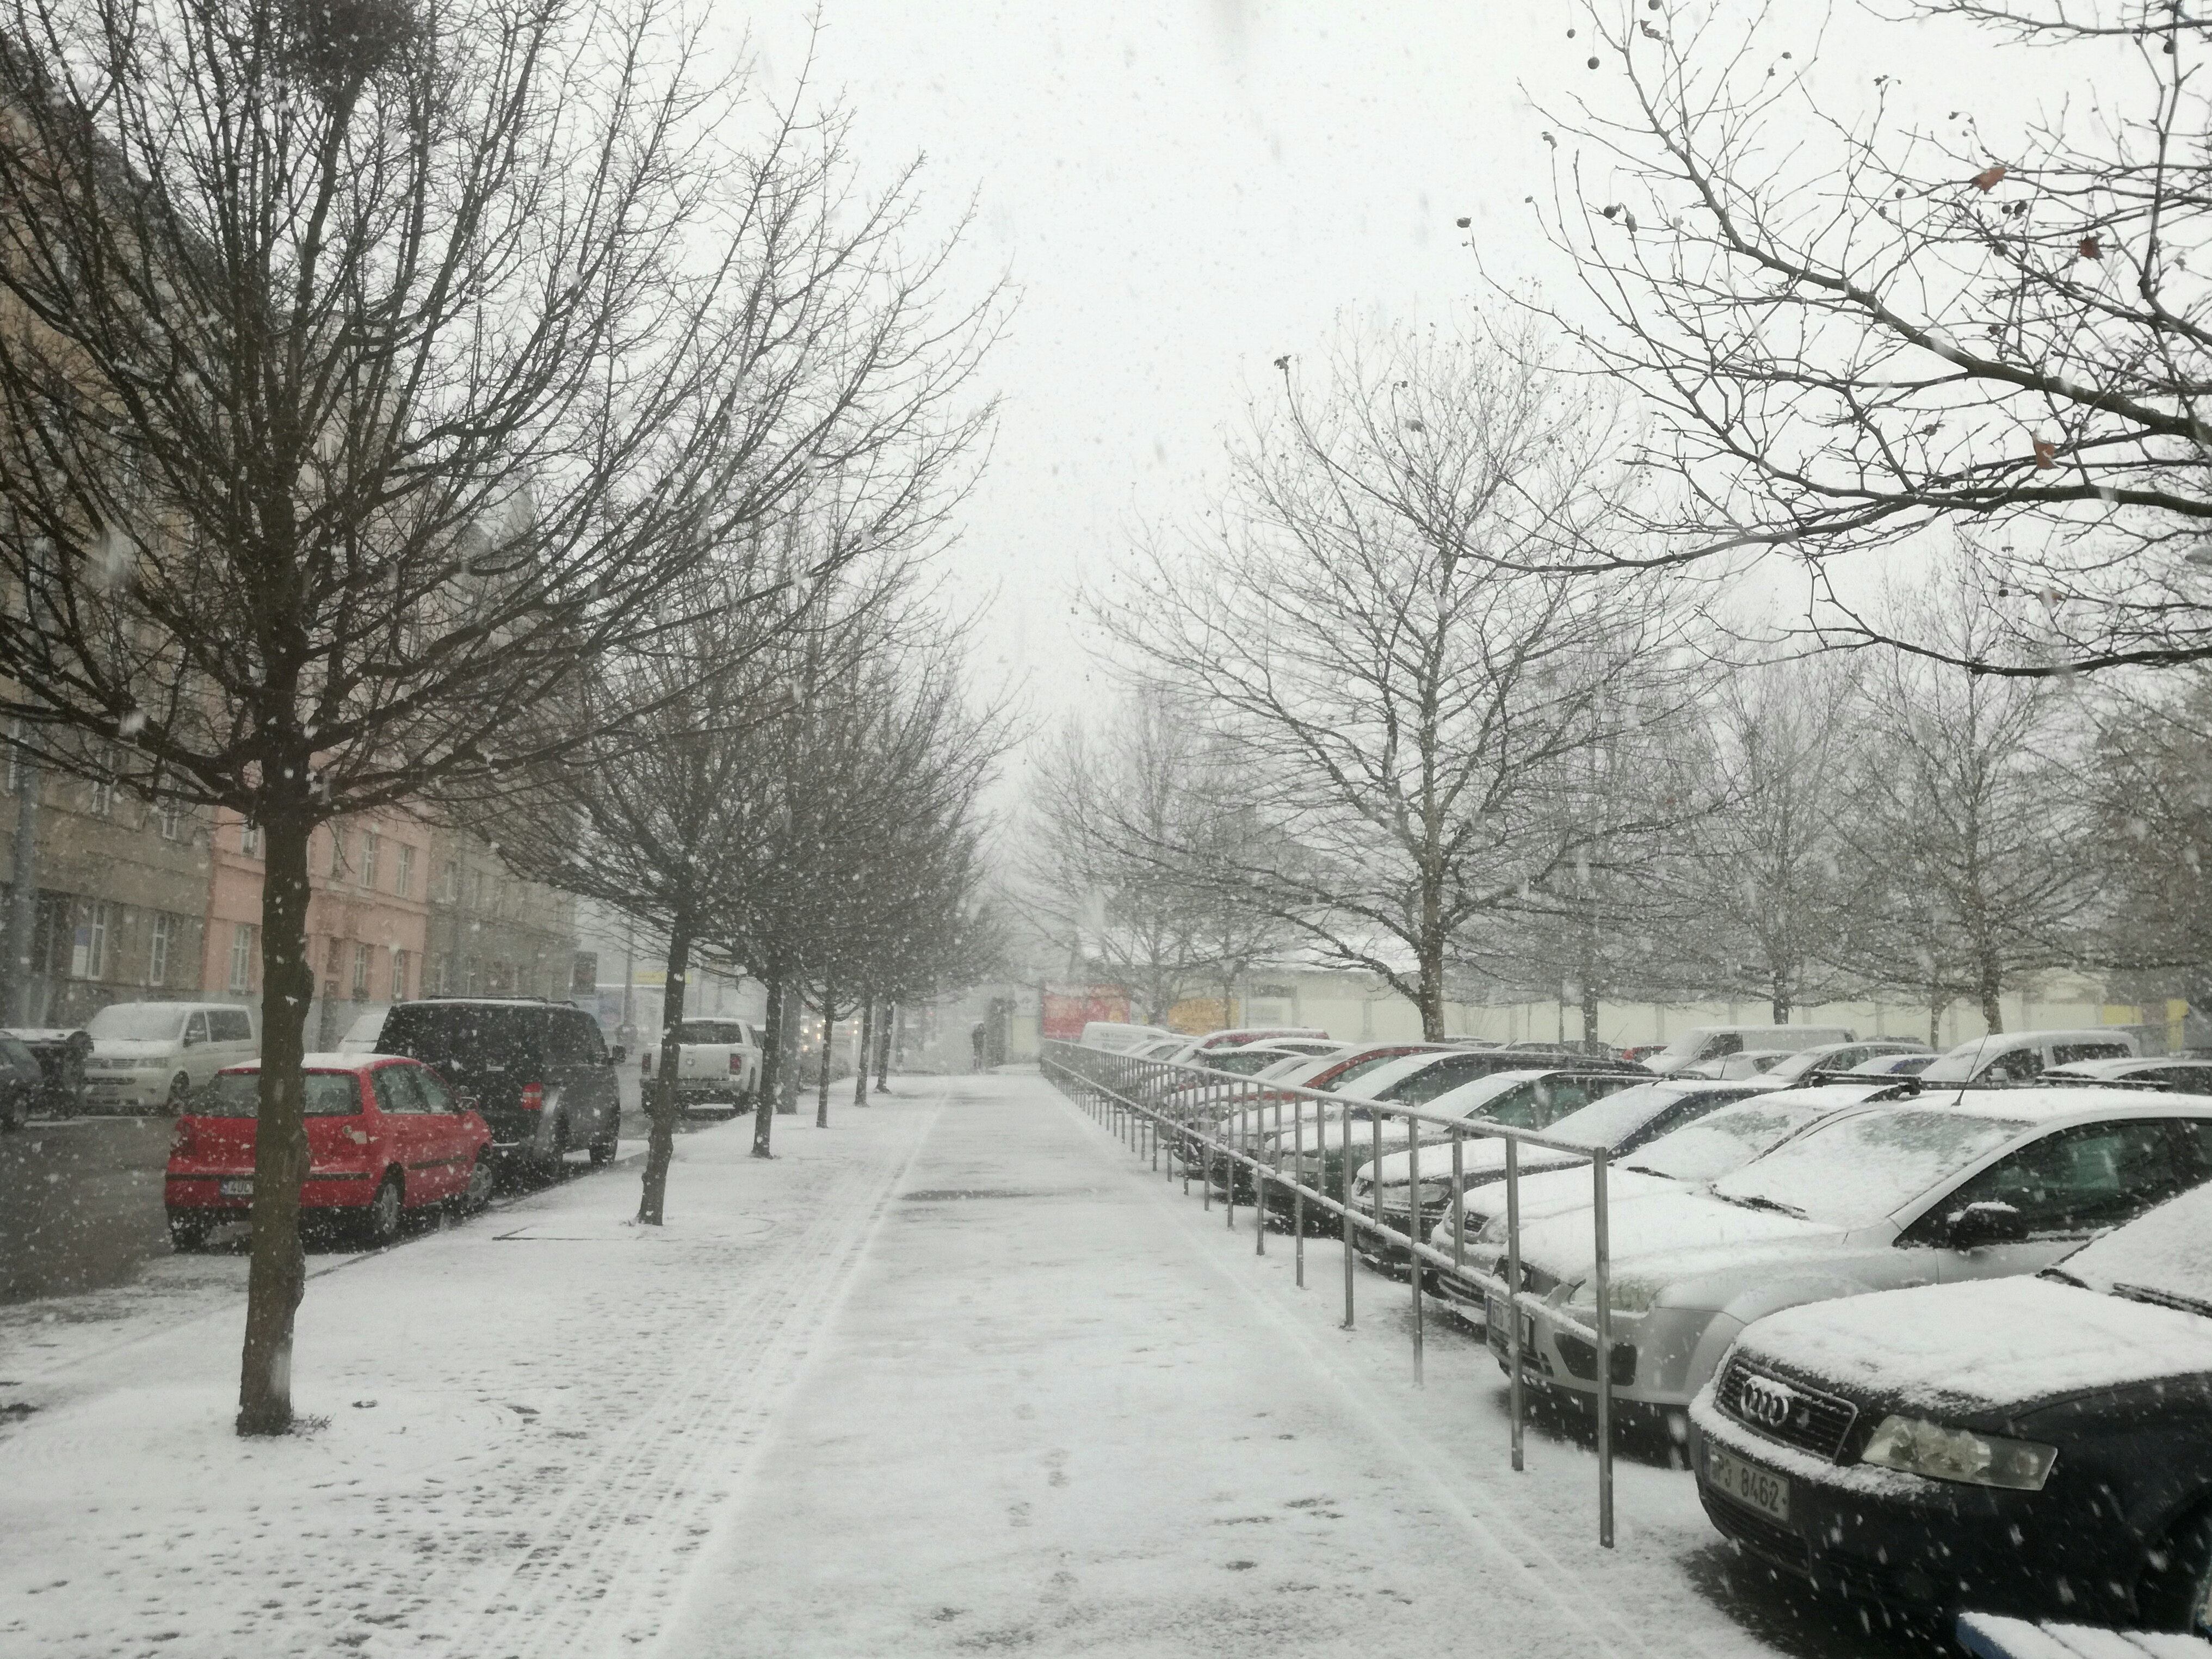 Plzeň – zima 2019